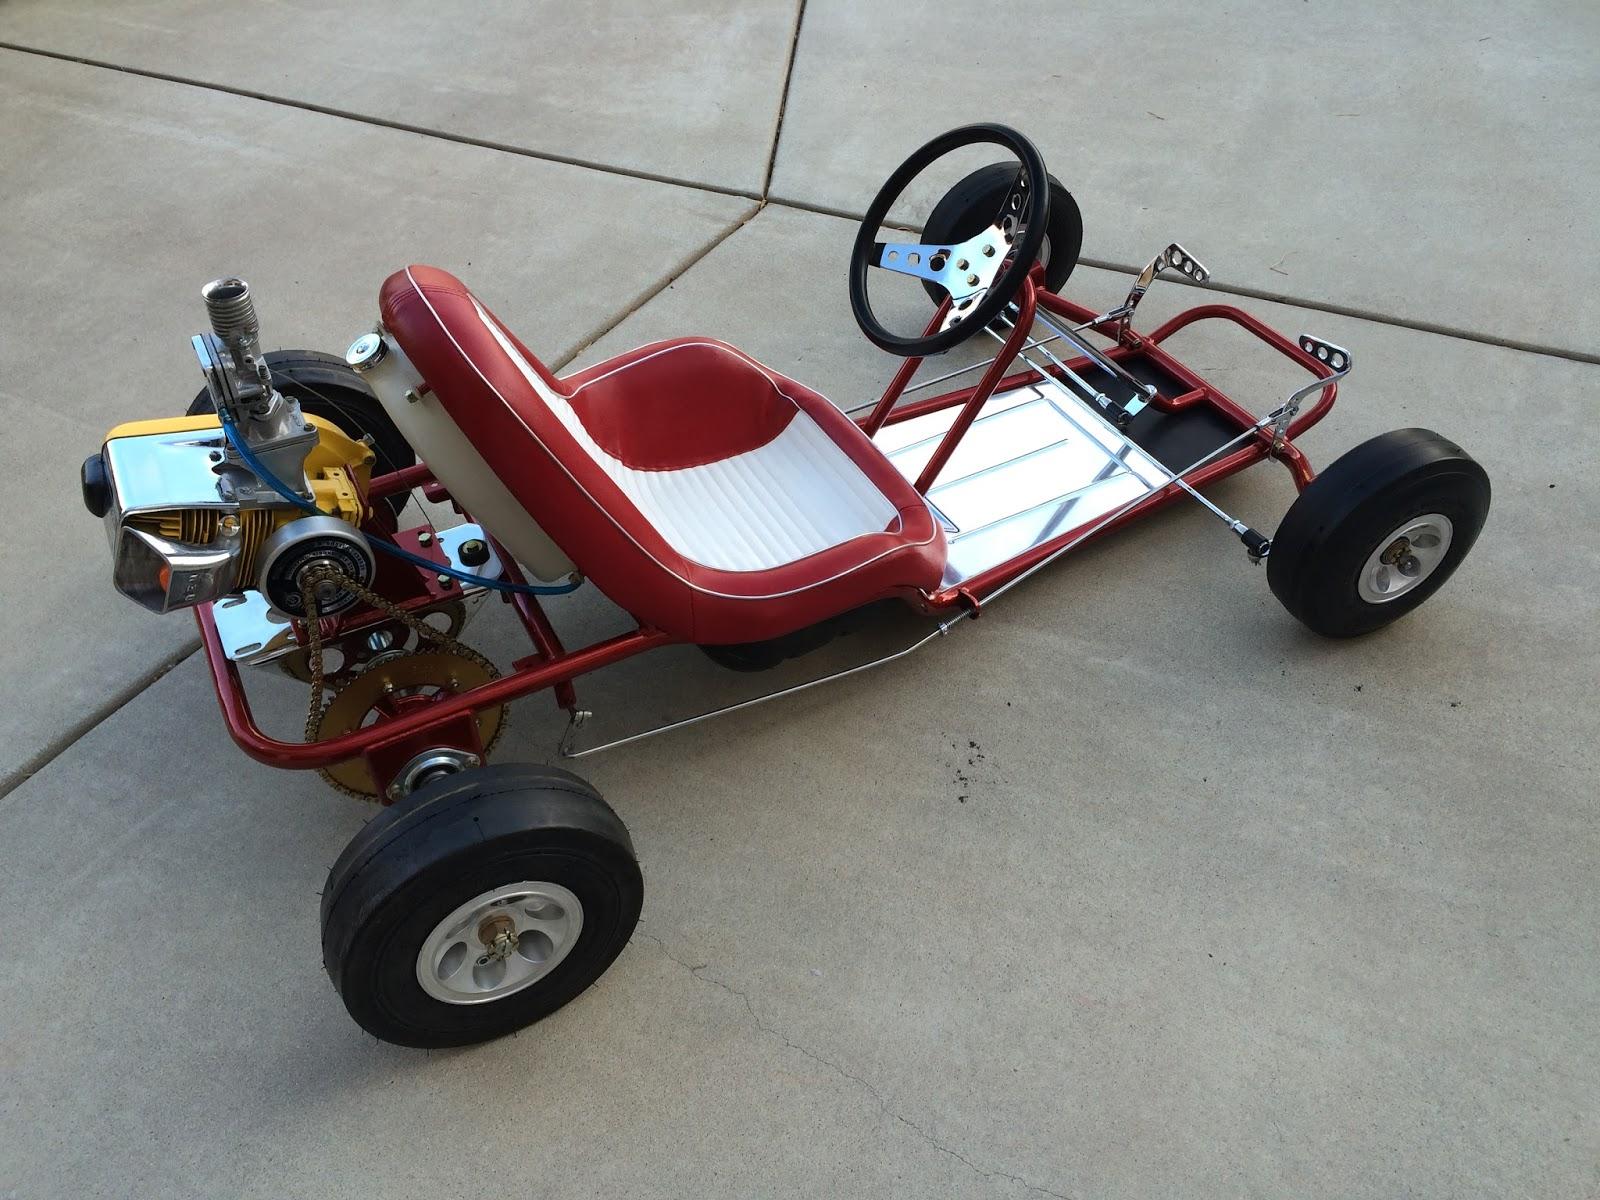 Cary's Corvettes: The Fox Kart